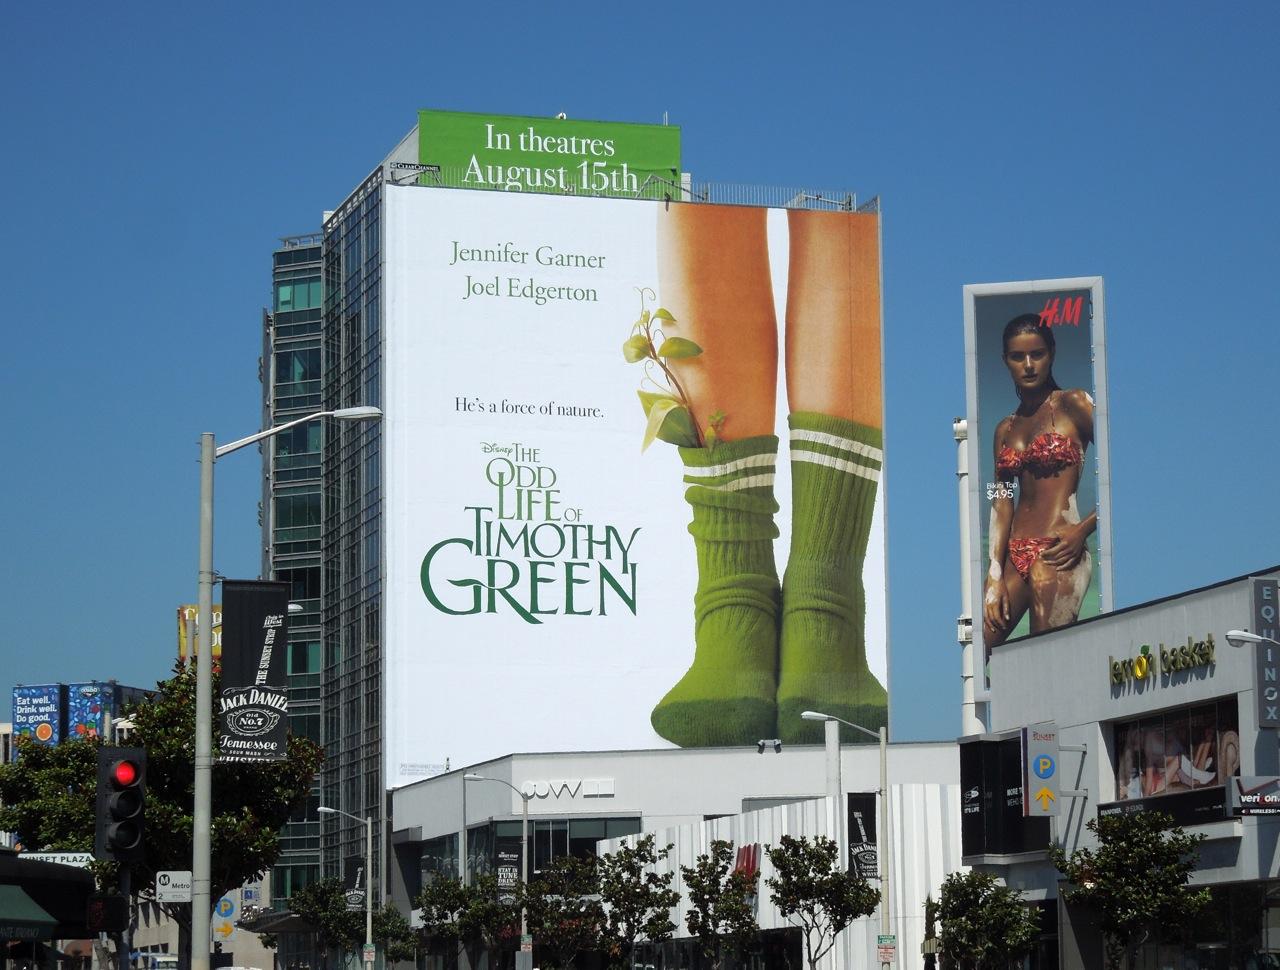 http://2.bp.blogspot.com/-EnwkFIl8BQU/UAhjXroP64I/AAAAAAAAuDQ/pVdHq0Ewl8c/s1600/odd+timothy+green+billboard.jpg